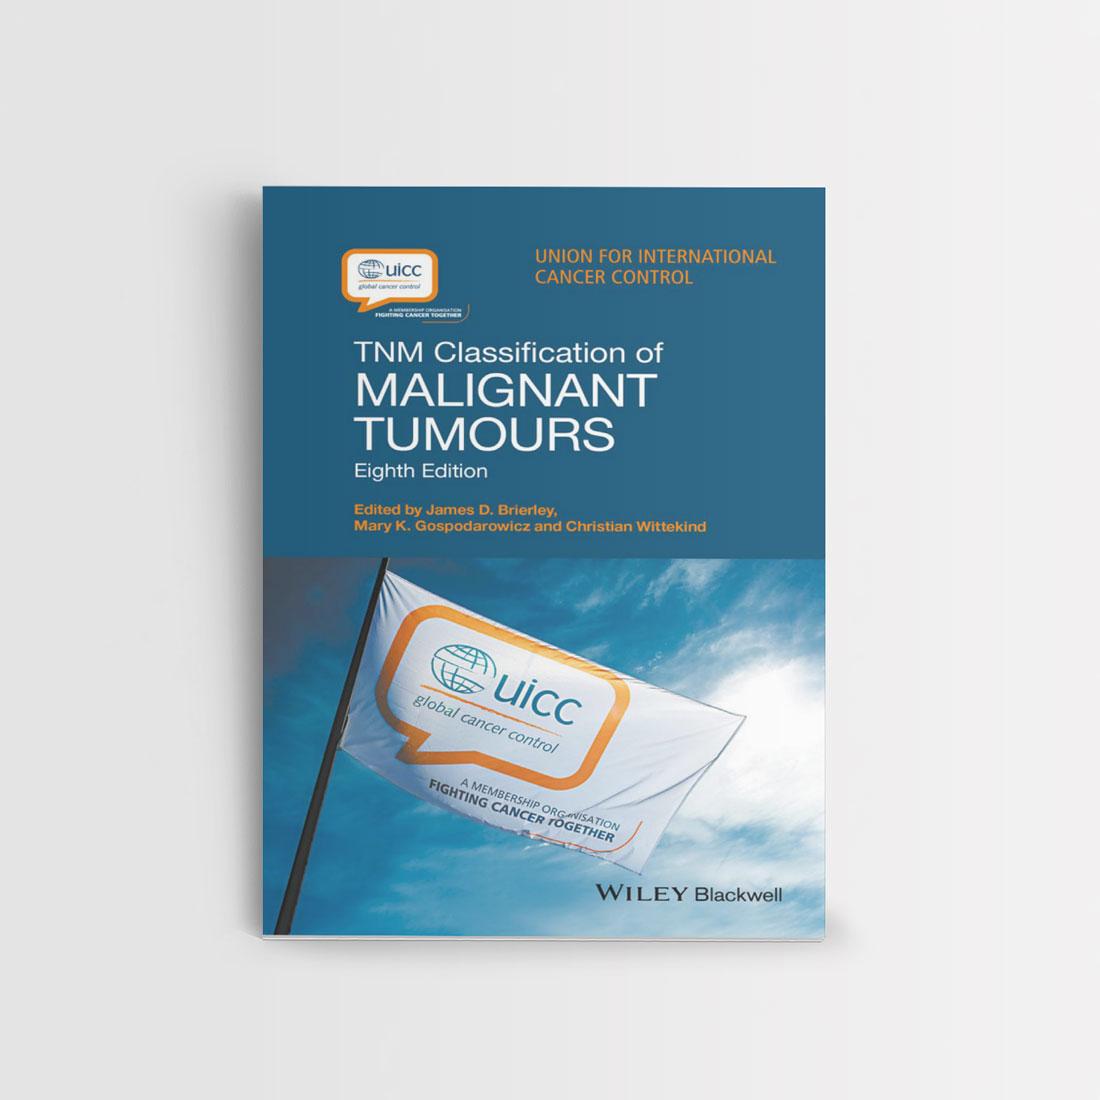 TNM Classification of Malignant Tumours, 8th Edition - Enea